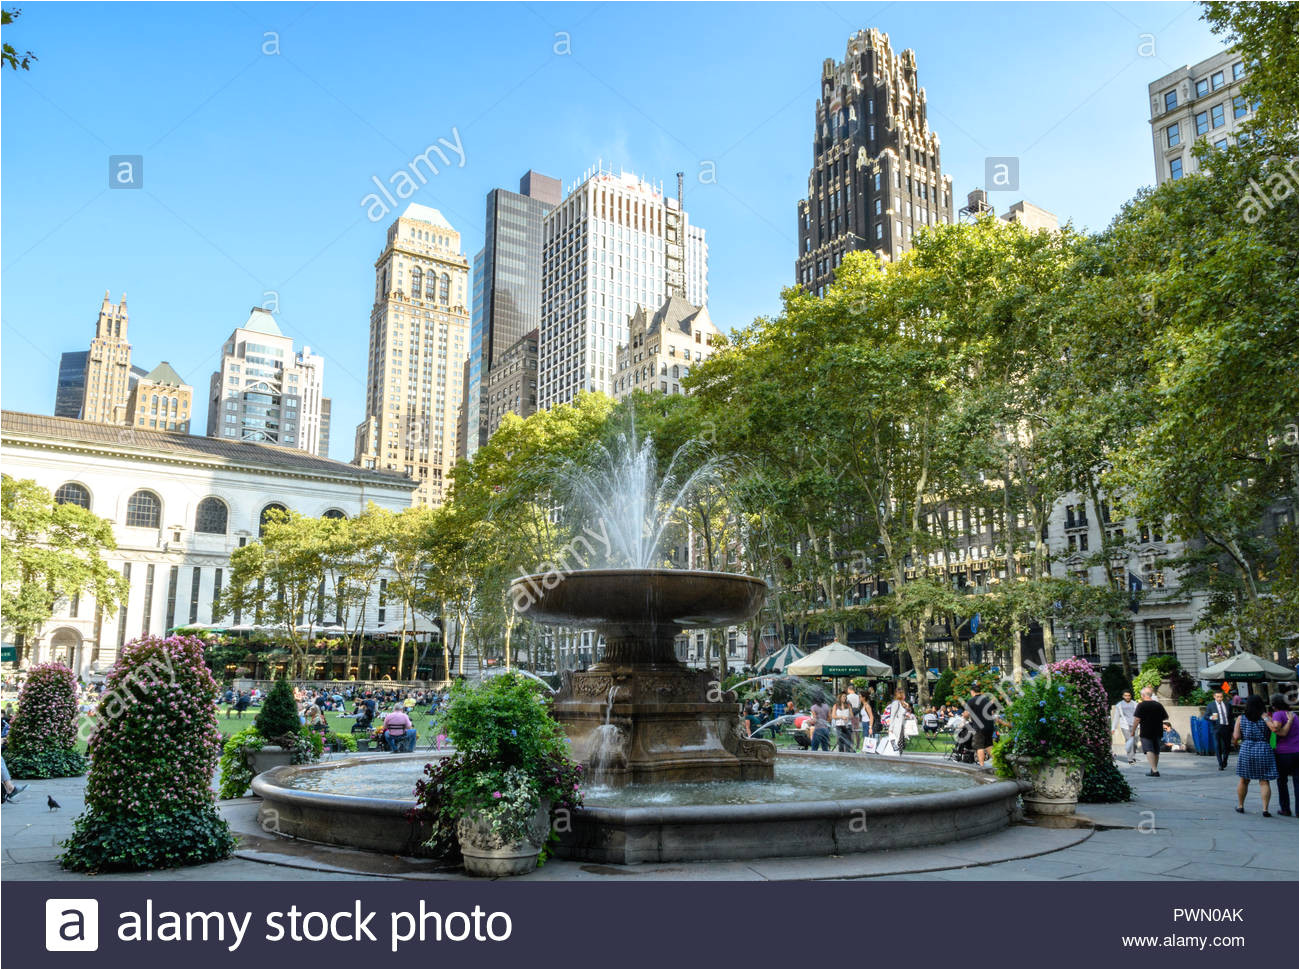 the fountain in bryant park new york manhattan